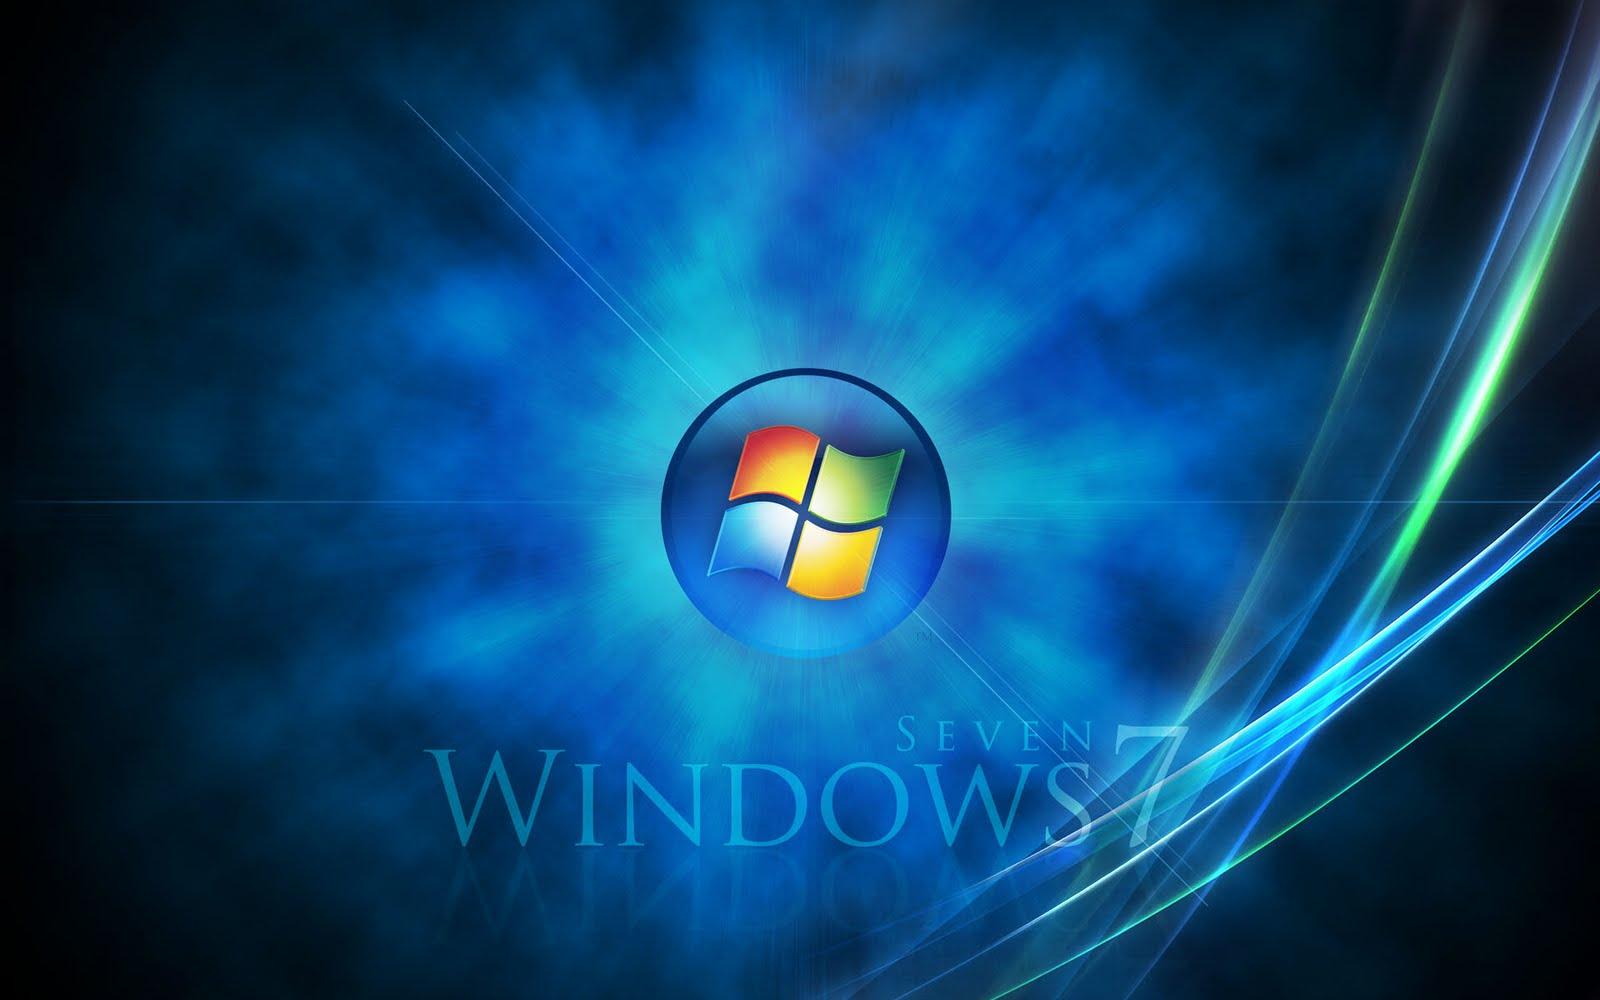 http://2.bp.blogspot.com/_Qc6aMdLT994/S6pU4OOt9EI/AAAAAAAAFGc/gynDp4qc4PI/s1600/Windows%2B7%2Bultimate%2Bcollection%2Bof%2Bwallpapers%2B(5).jpg